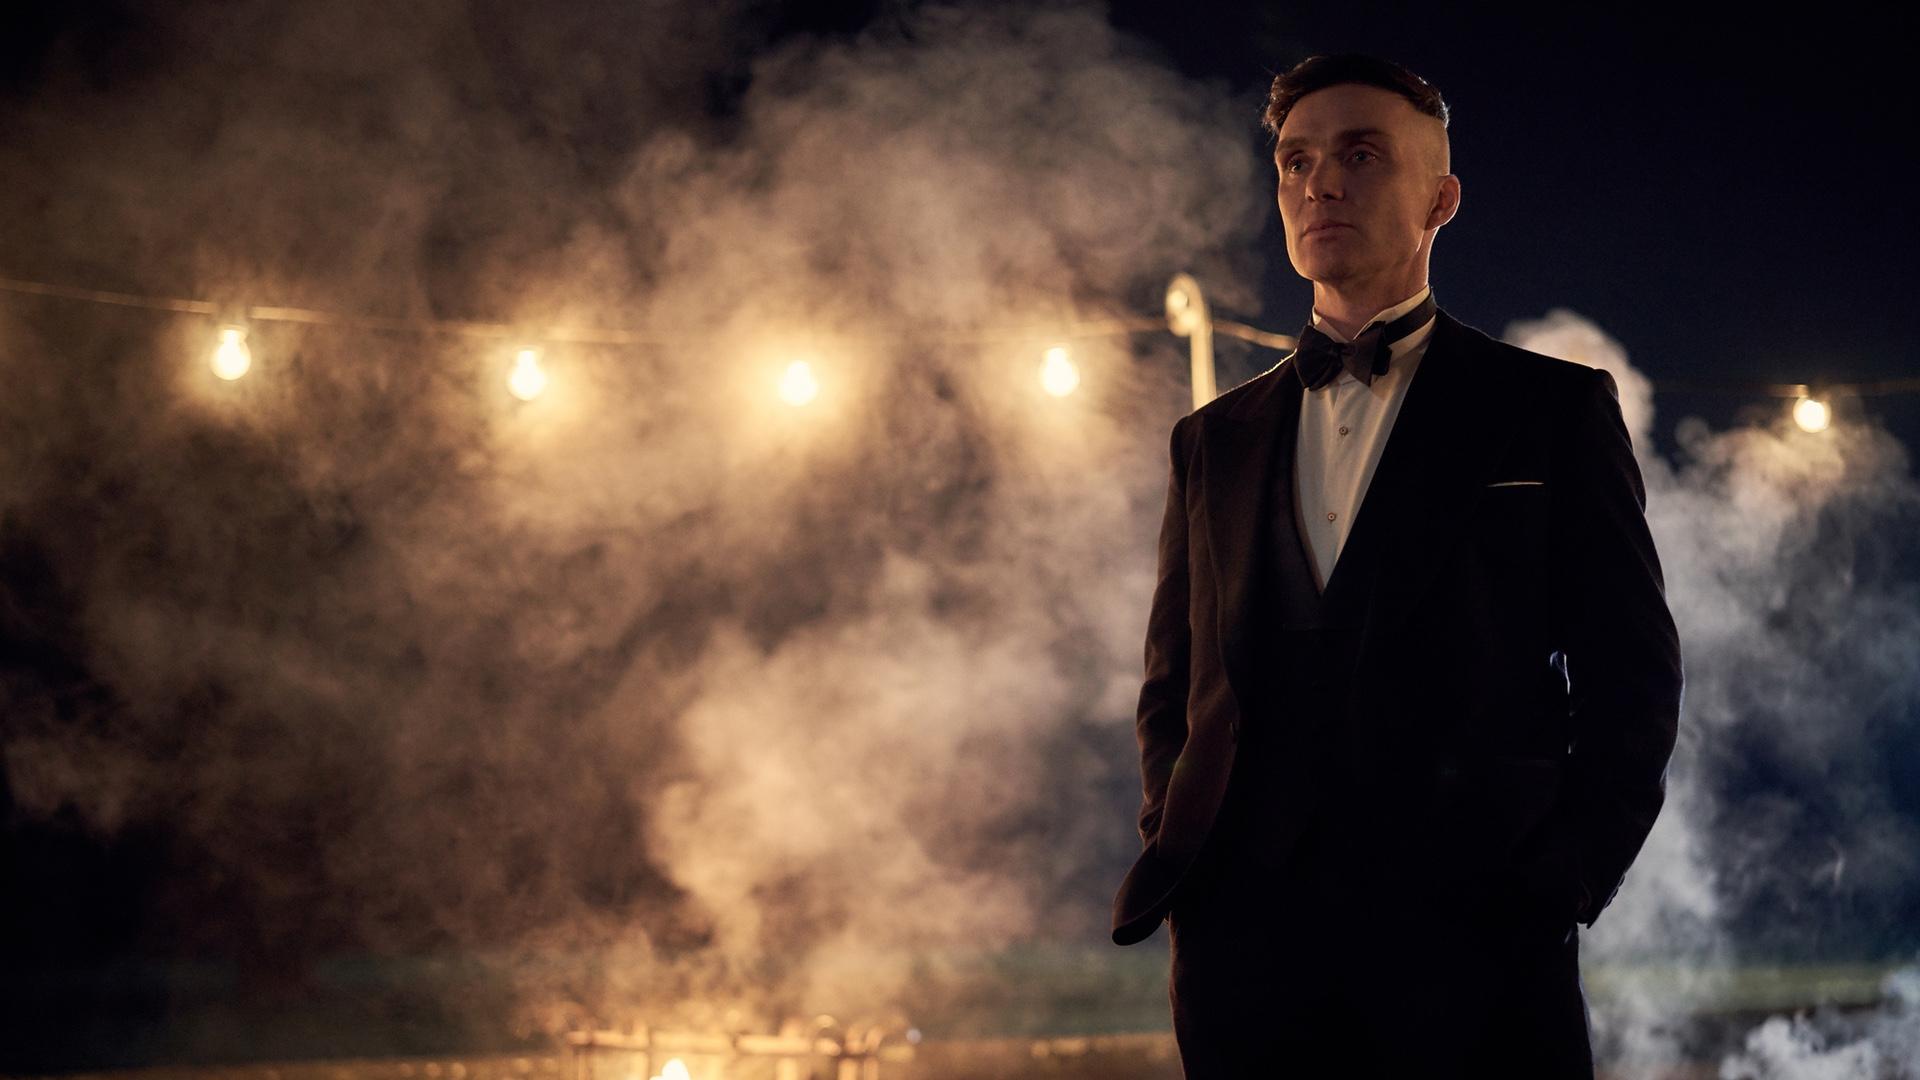 The Long Awaited Fifth Season Of Netflixs Peaky Blinders